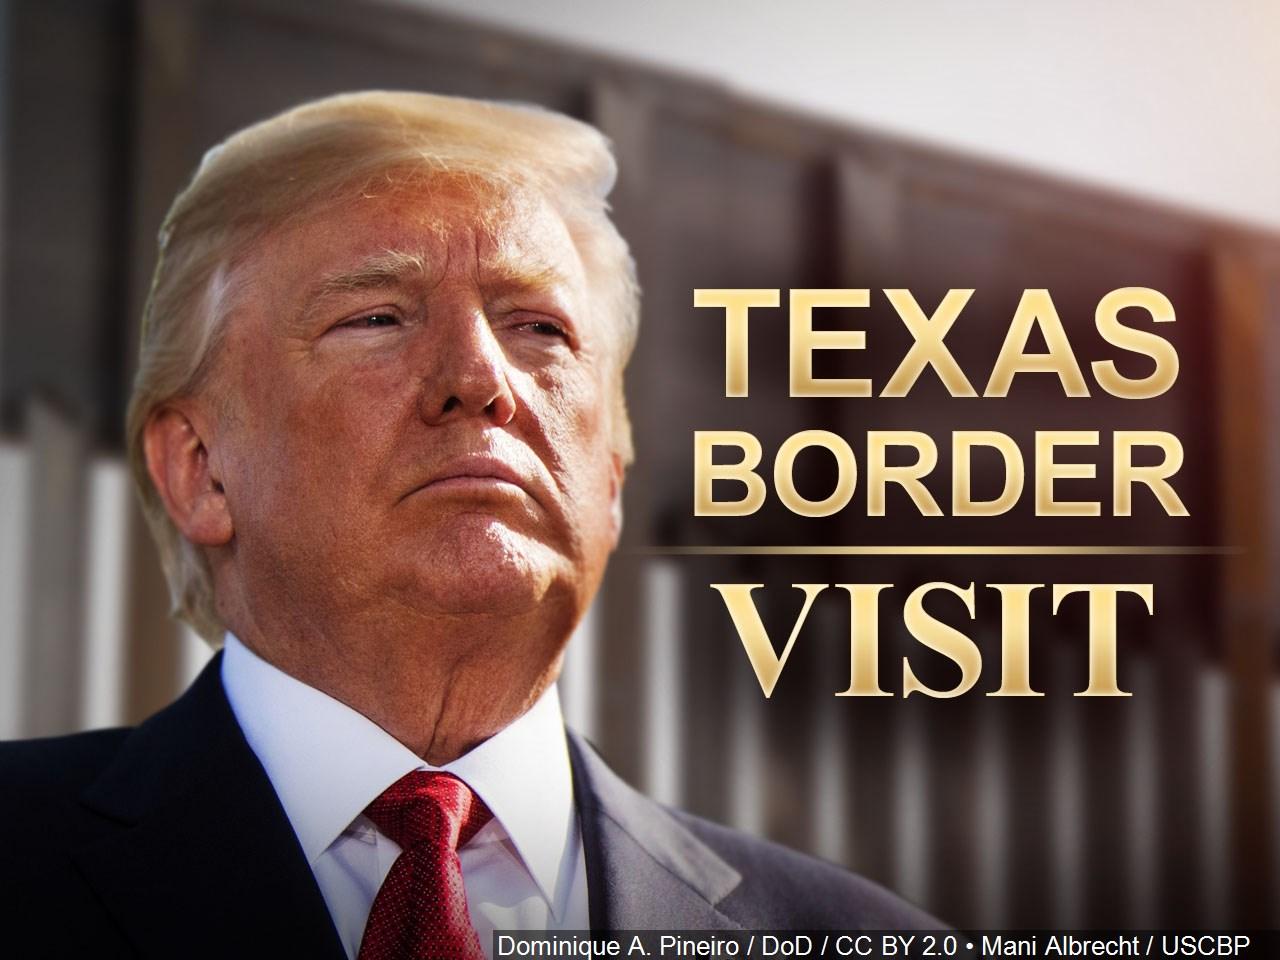 Texas Border Visit Trump_1549902396840-118809306.jpg